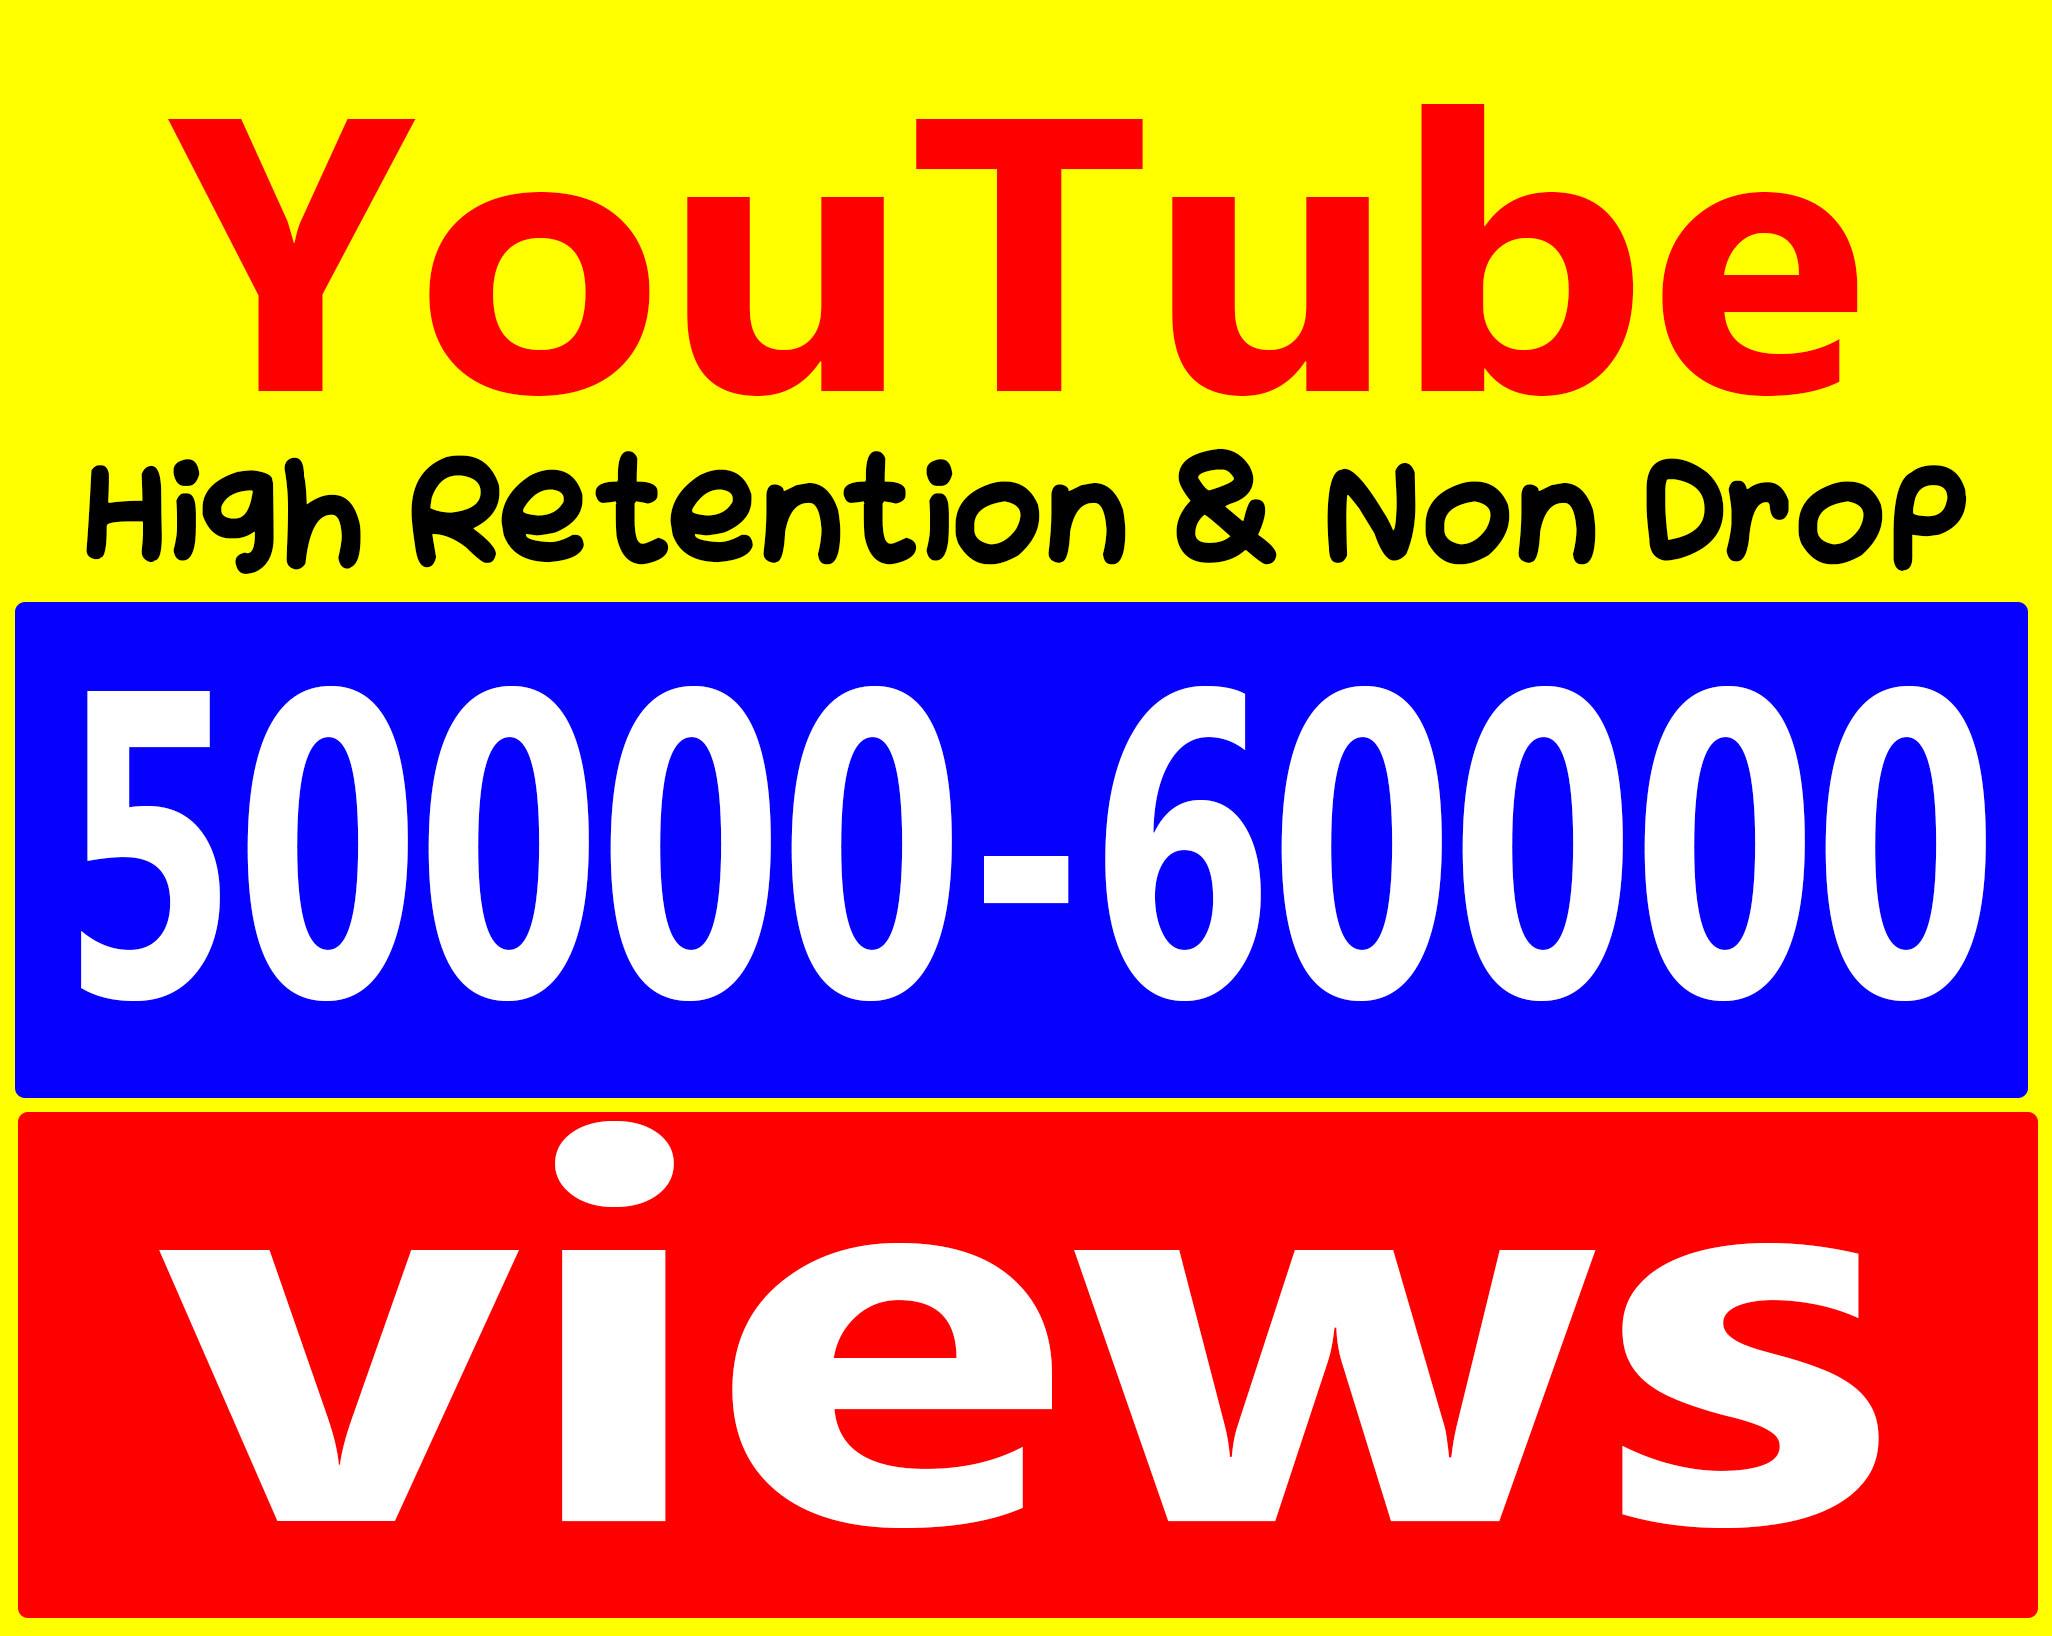 Fast 50,000 To 60,000 Views High Retention 9099 Adsense Safe amp Non Drop